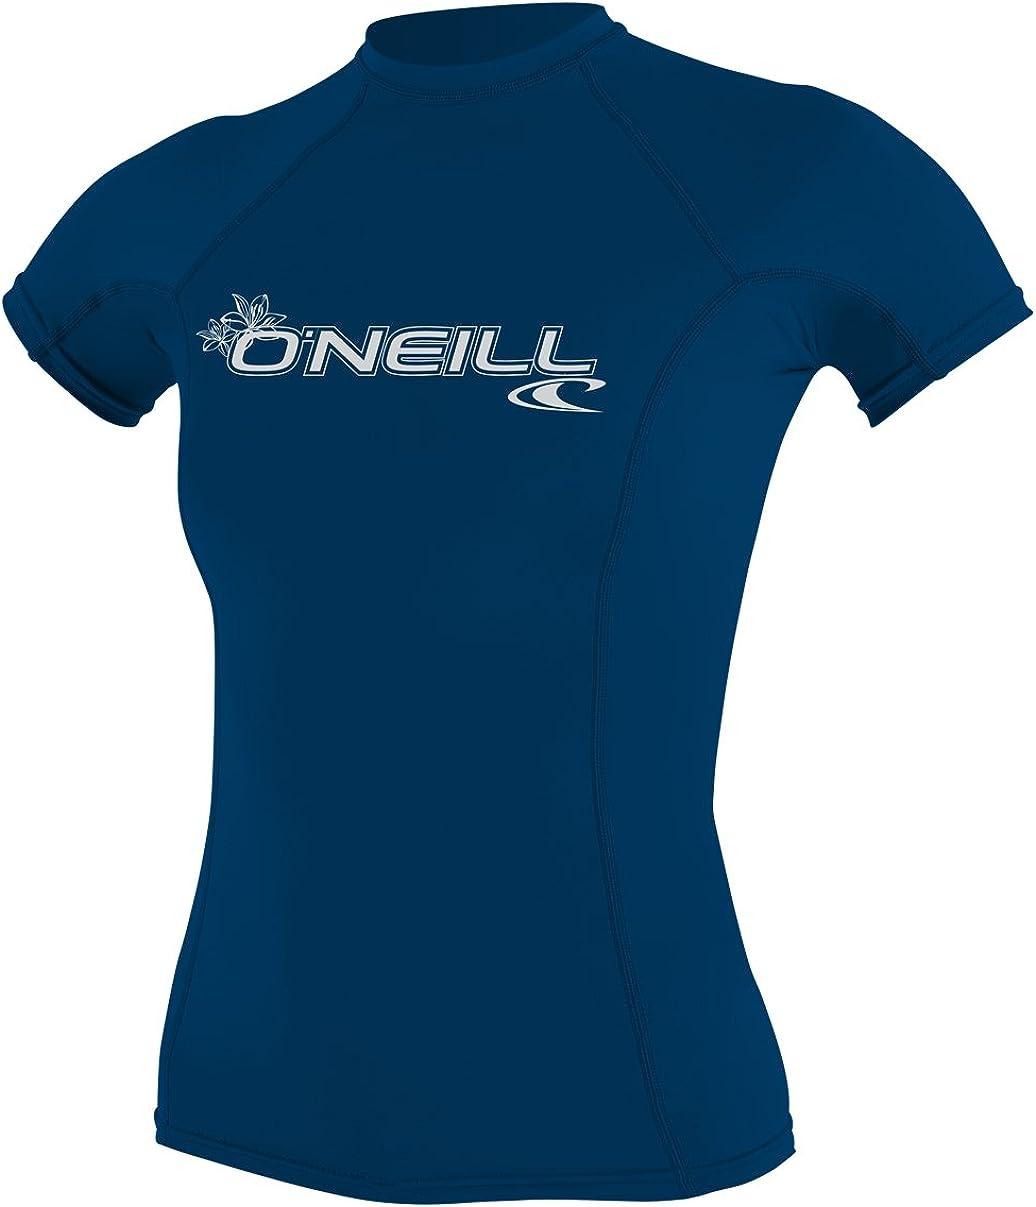 O'Neill Wetsuits Women's O'neill Basic Skins UPF 50+ Short Sleeve Rash Guard